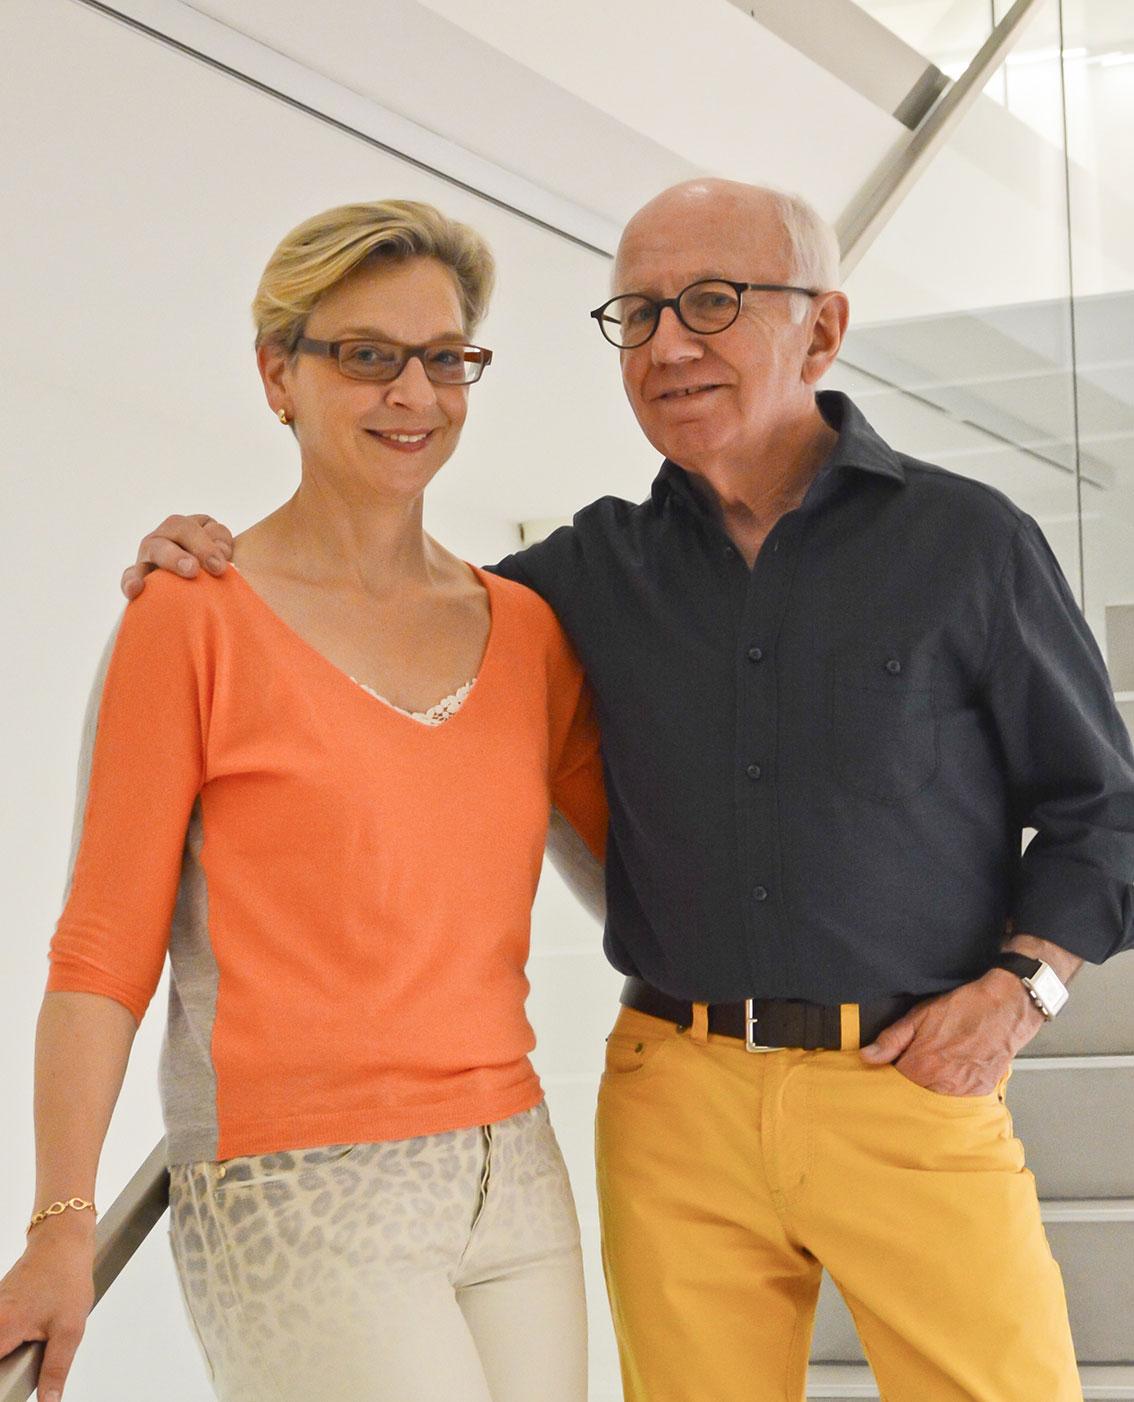 Dr.-Irene-Haas-Ulrich-van-Gemmern